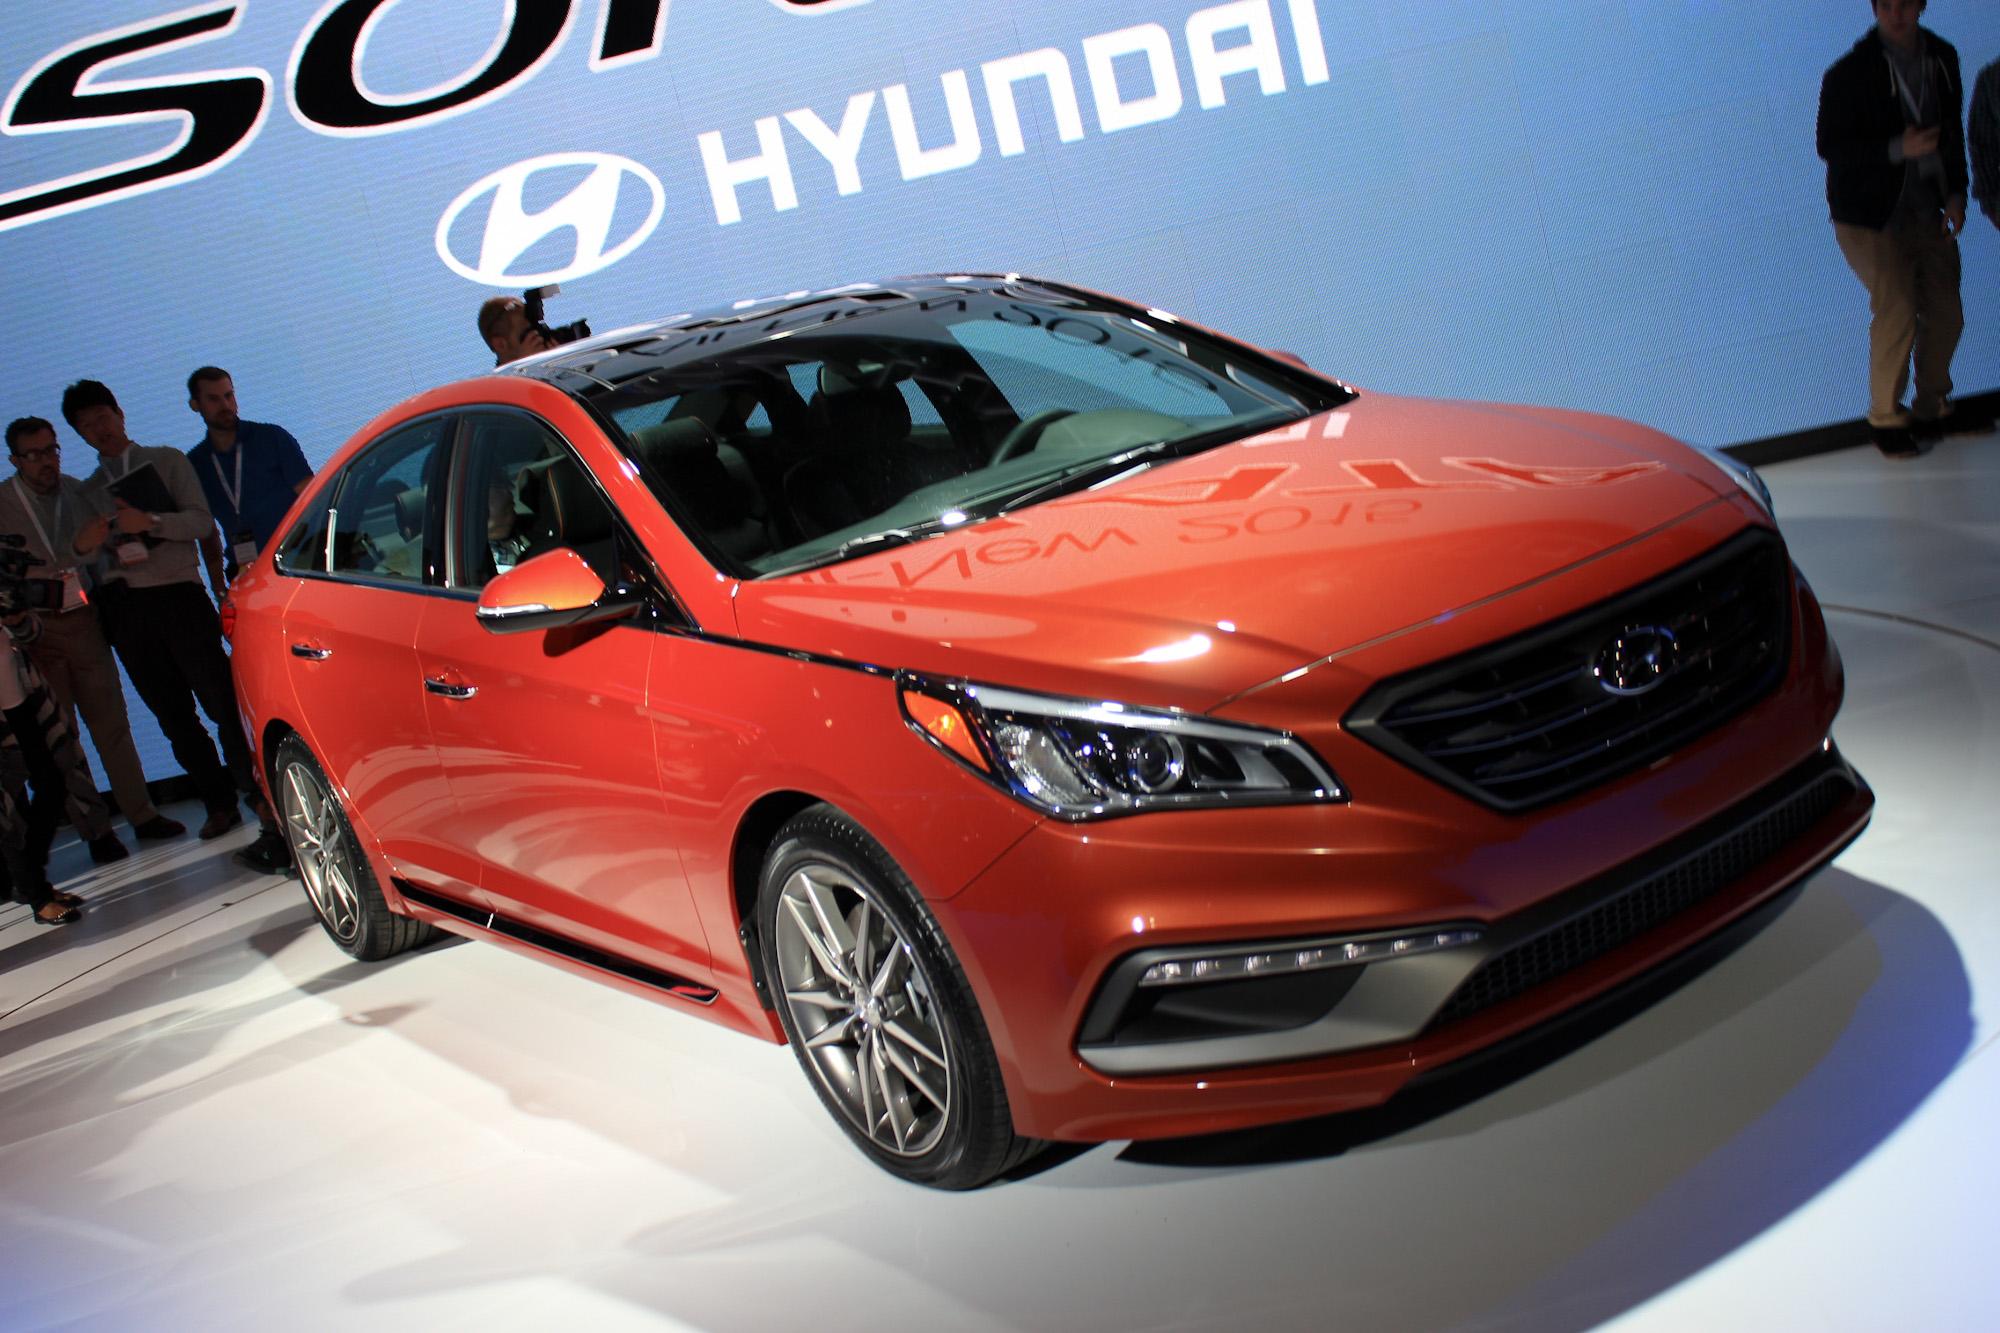 Lastest 2015 Hyundai Sonata Debuts At 2014 New York Auto Show